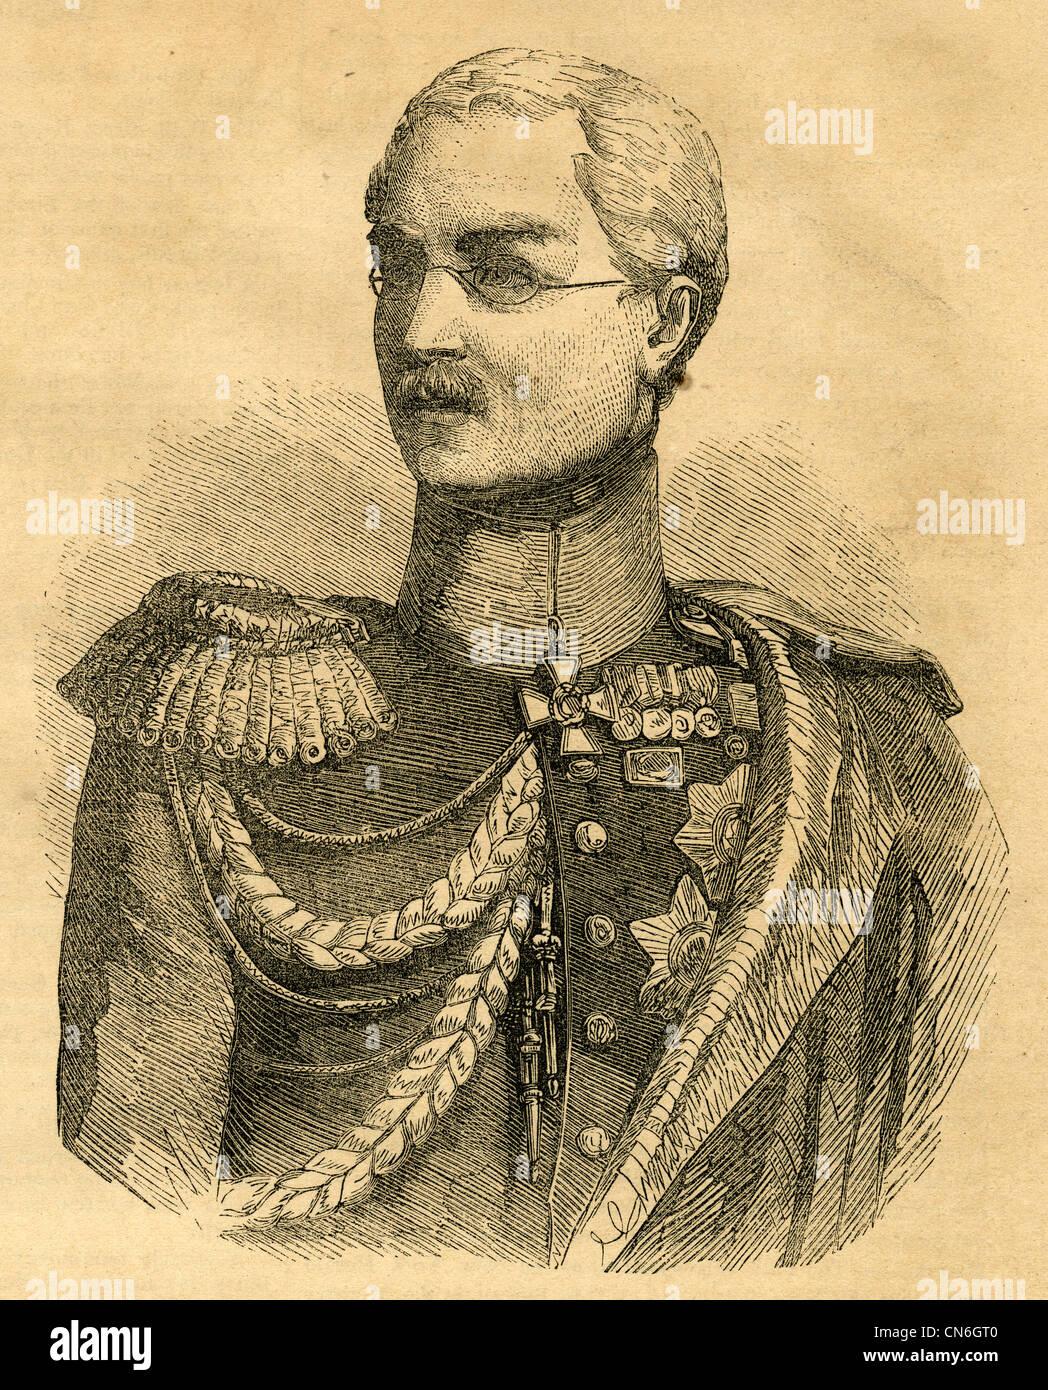 1854 engraving, Prince Mikhail Dmitrievich Gorchakov (1793–1861). - Stock Image